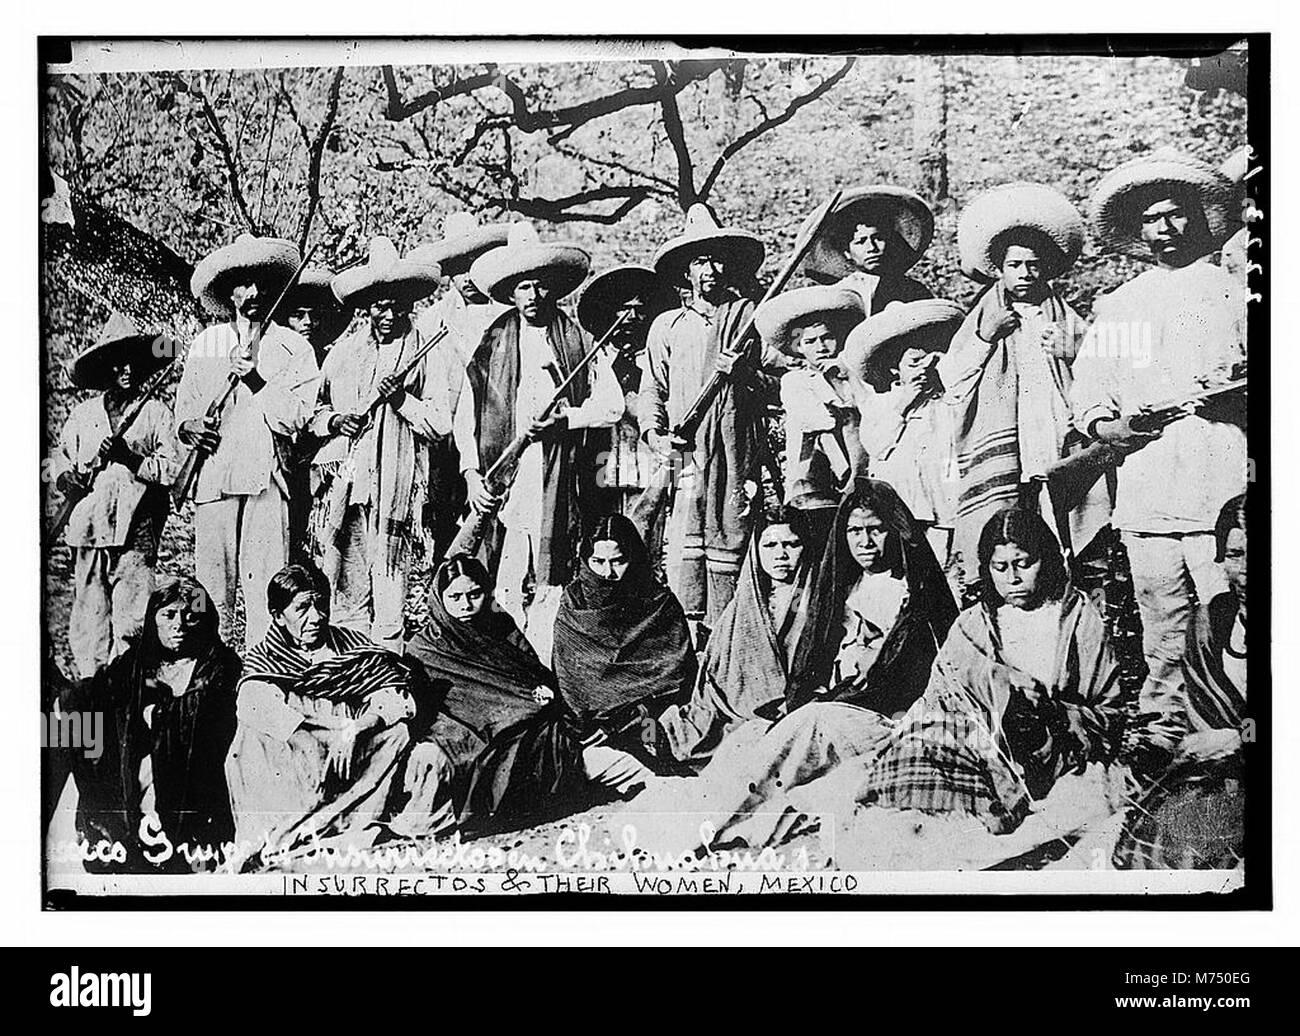 Fotos de la revolucion mexicana de 1910 48